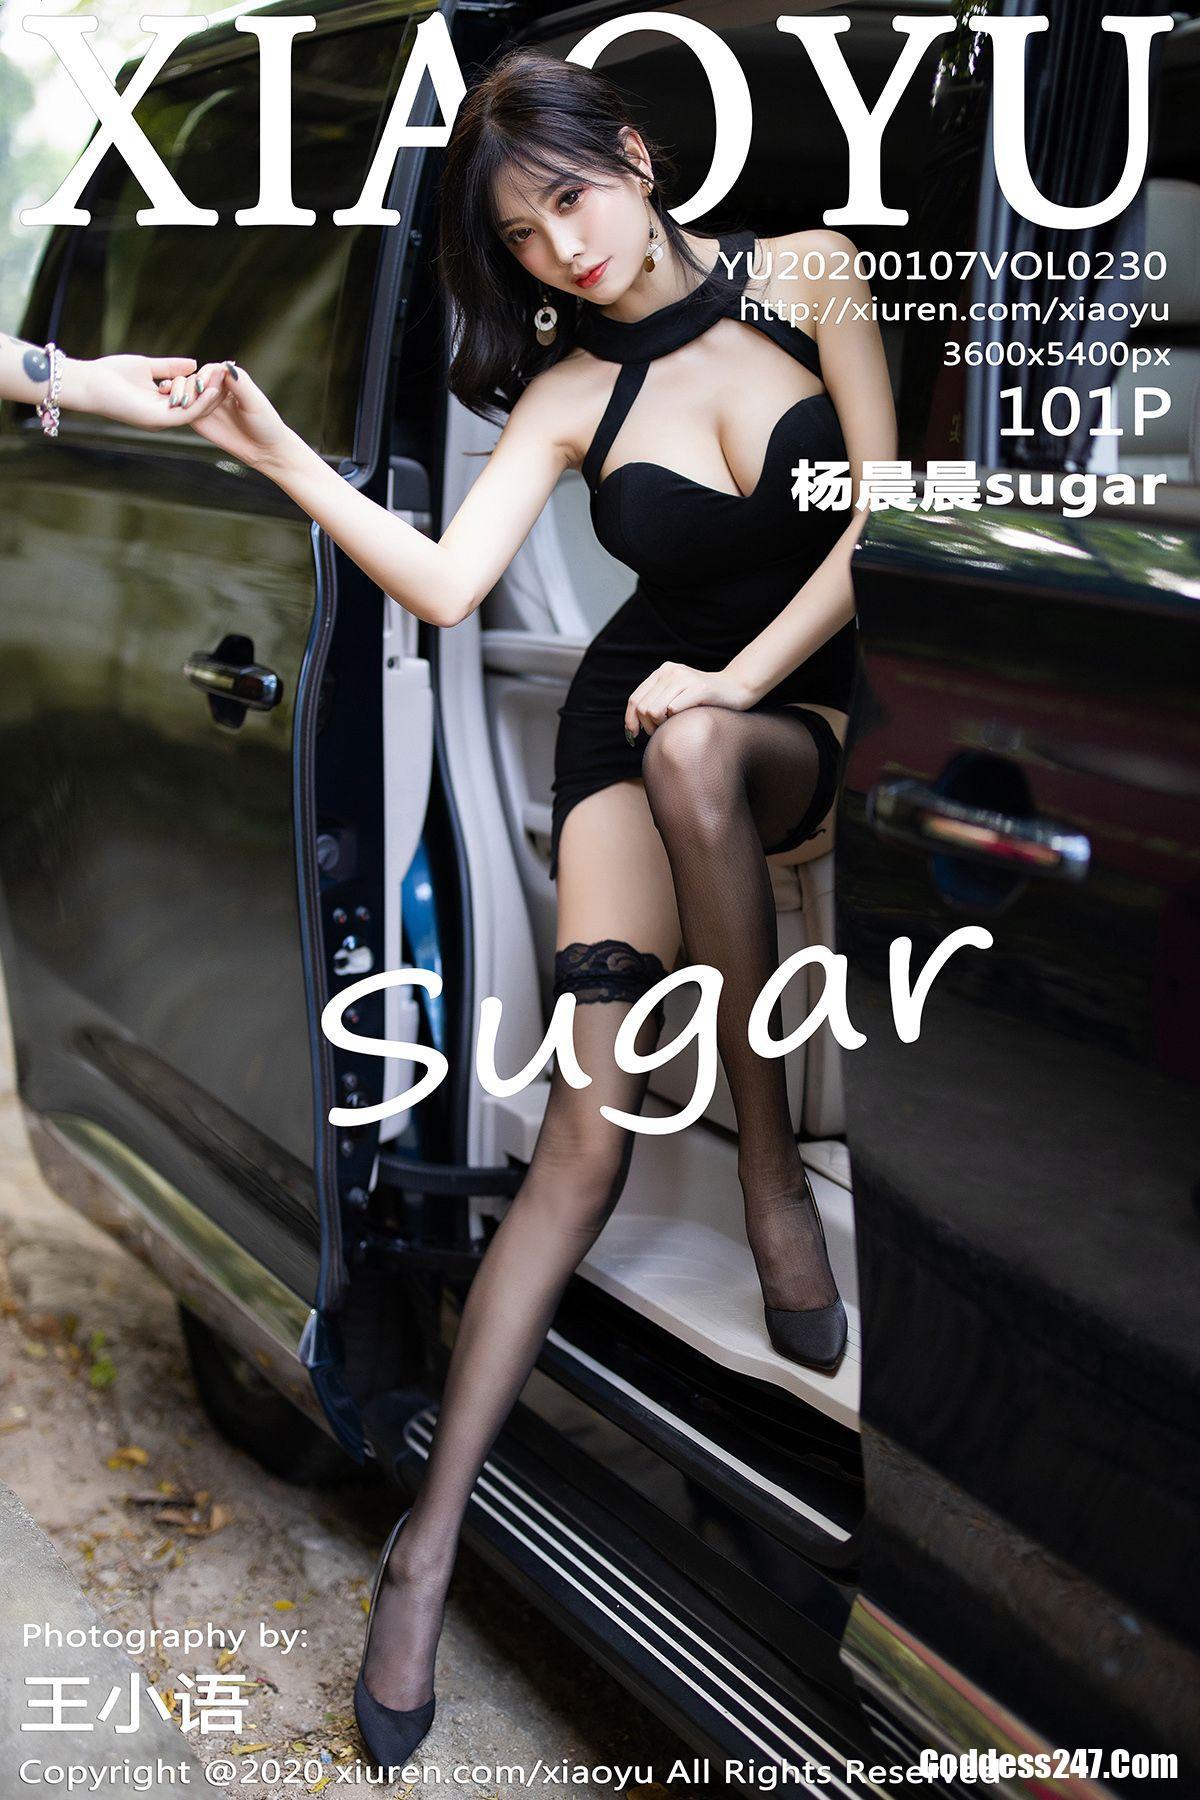 XiaoYu Vol.230 杨晨晨sugar